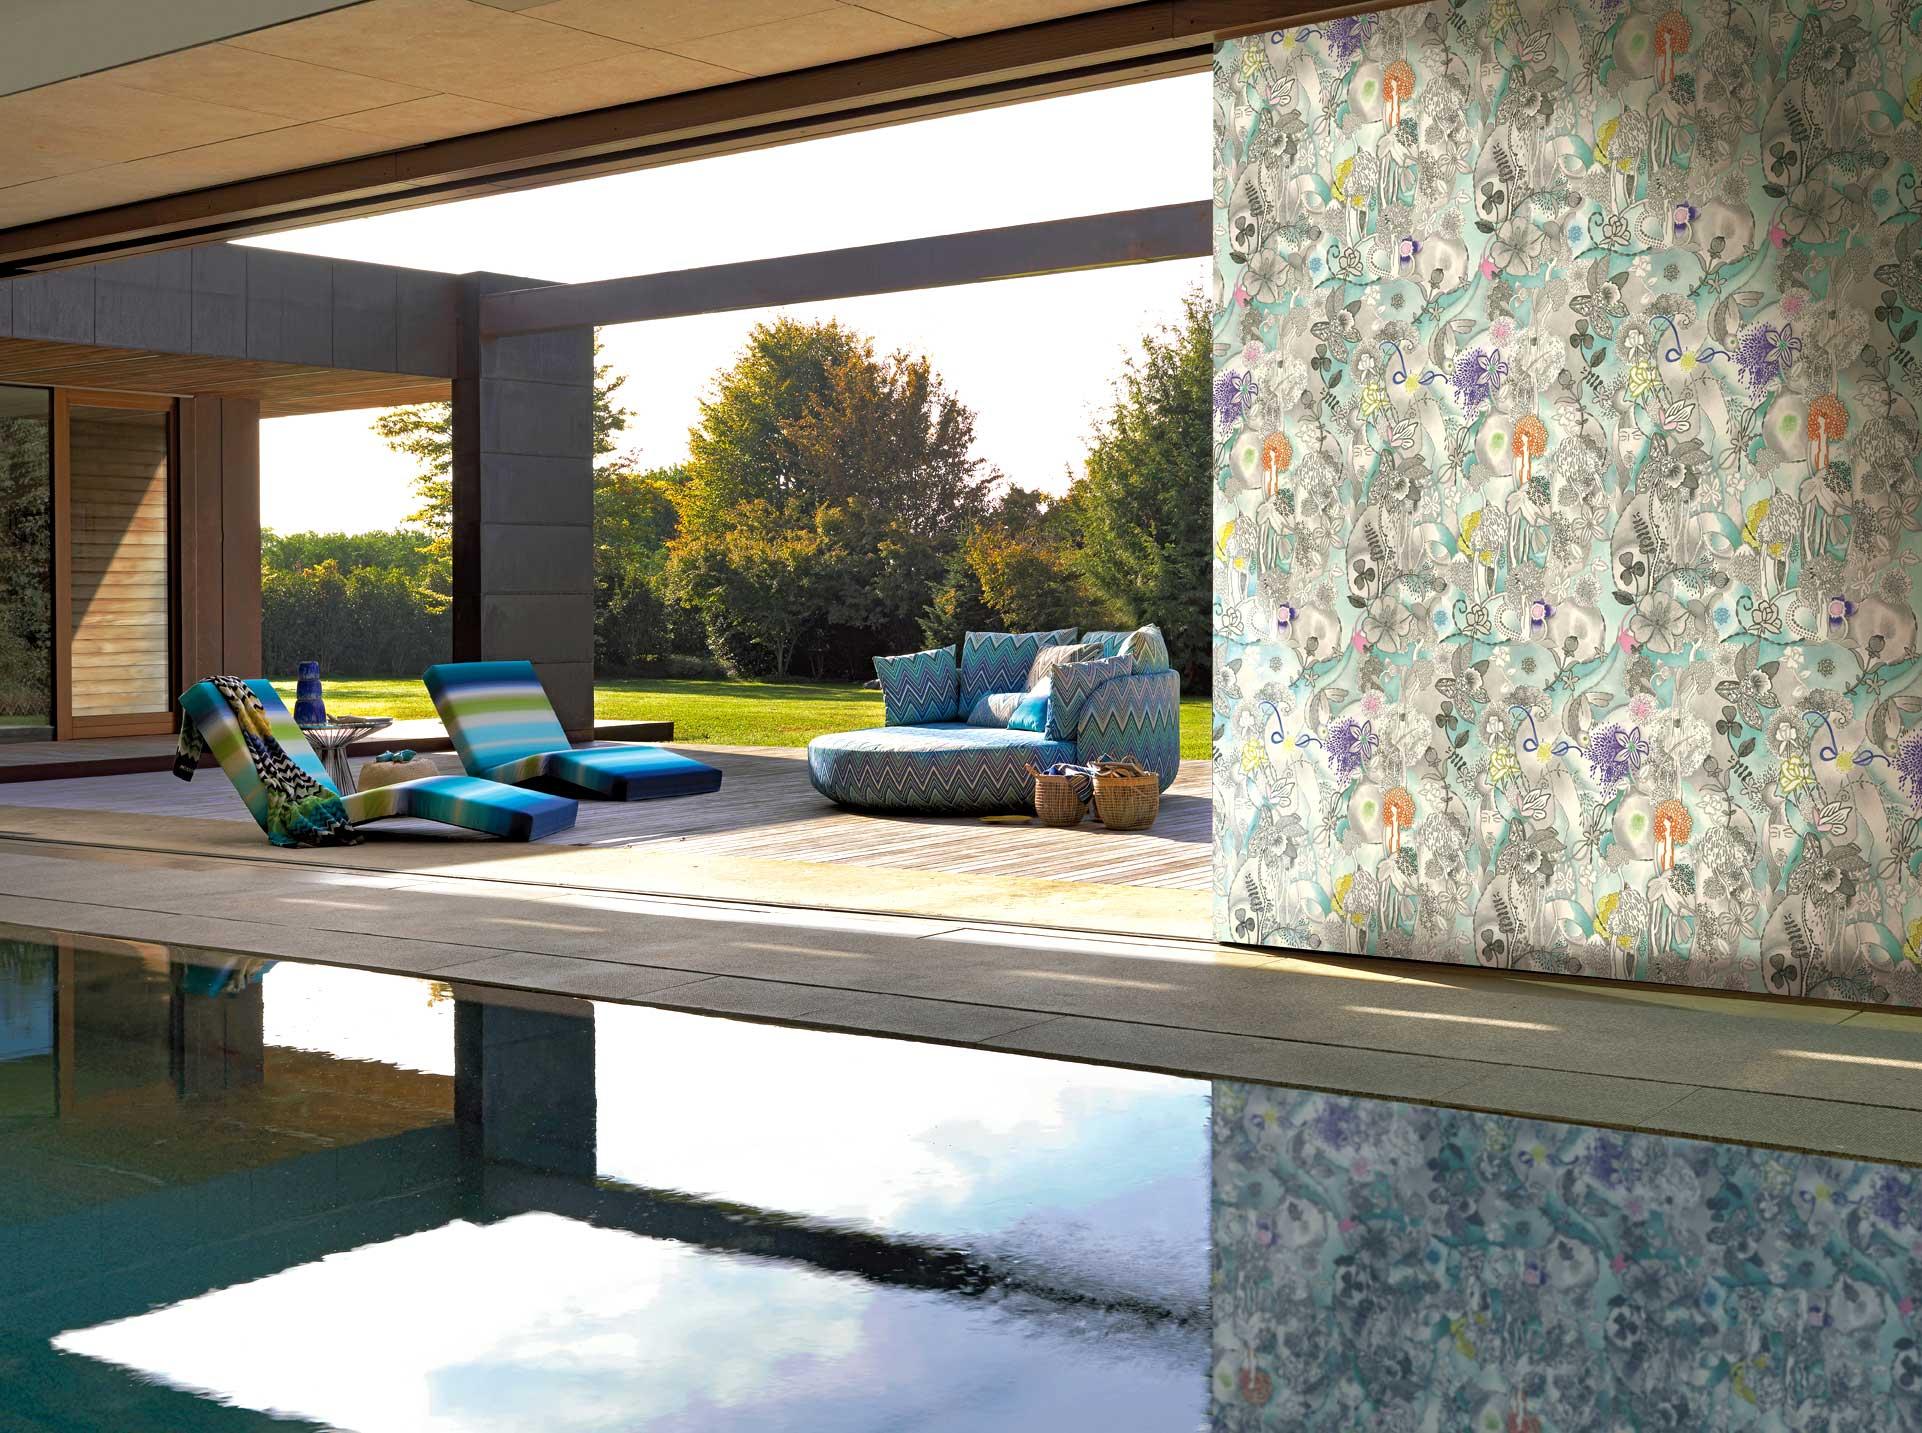 italienische design tapeten online kaufen. Black Bedroom Furniture Sets. Home Design Ideas